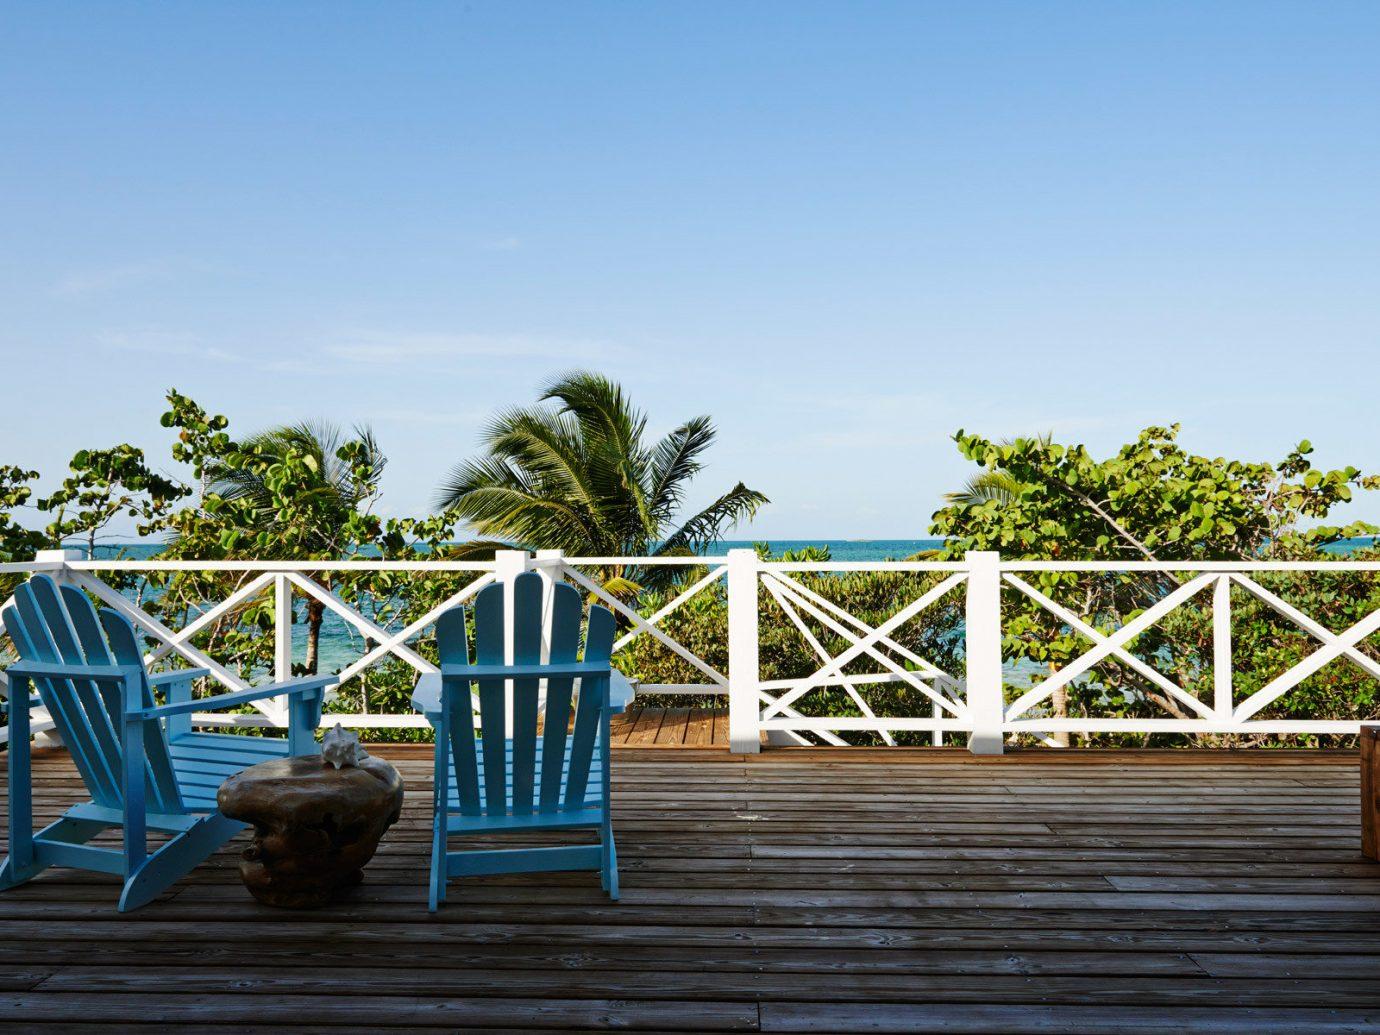 Beachfront Deck Hotels Luxury Patio Resort Romance Scenic views outdoor sky tree building walkway bridge wooden vacation estate wood boardwalk Beach day